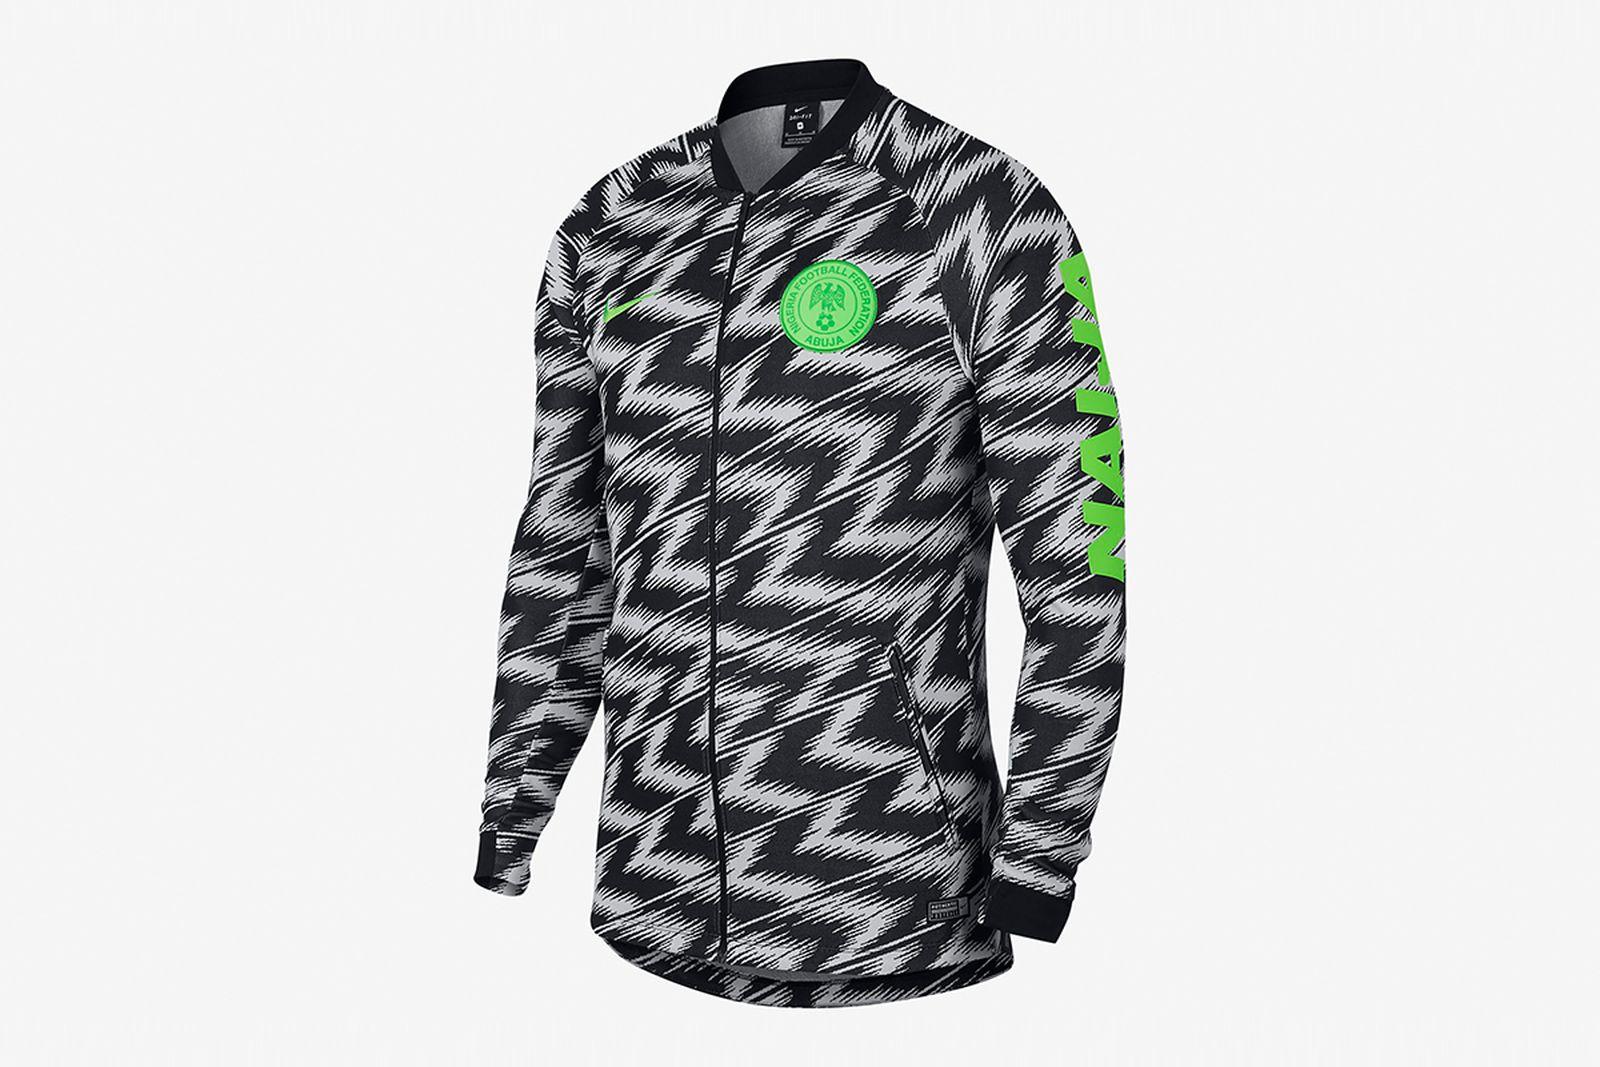 nigeria anthem jacket 2018 FIFA World Cup nigeria football kit